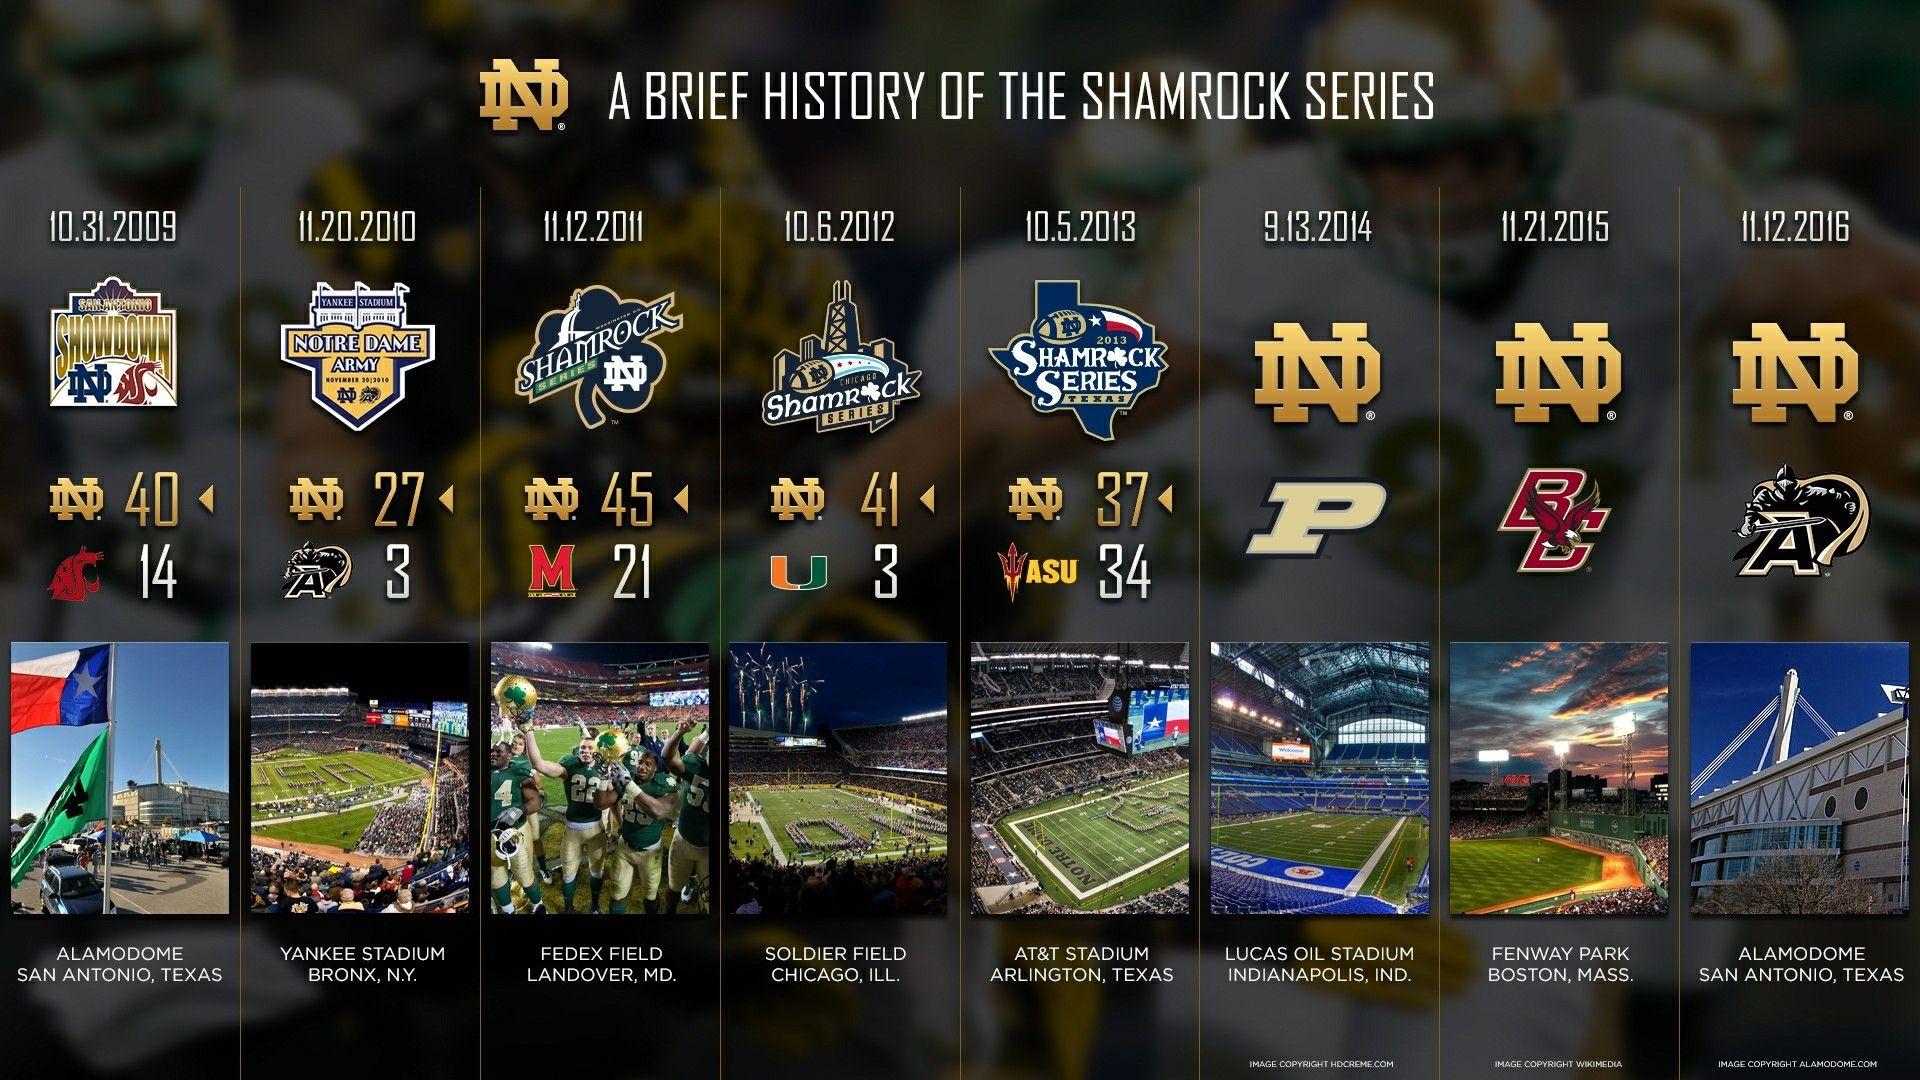 Shamrock Series Games ☘ Notre dame football, Notre dame